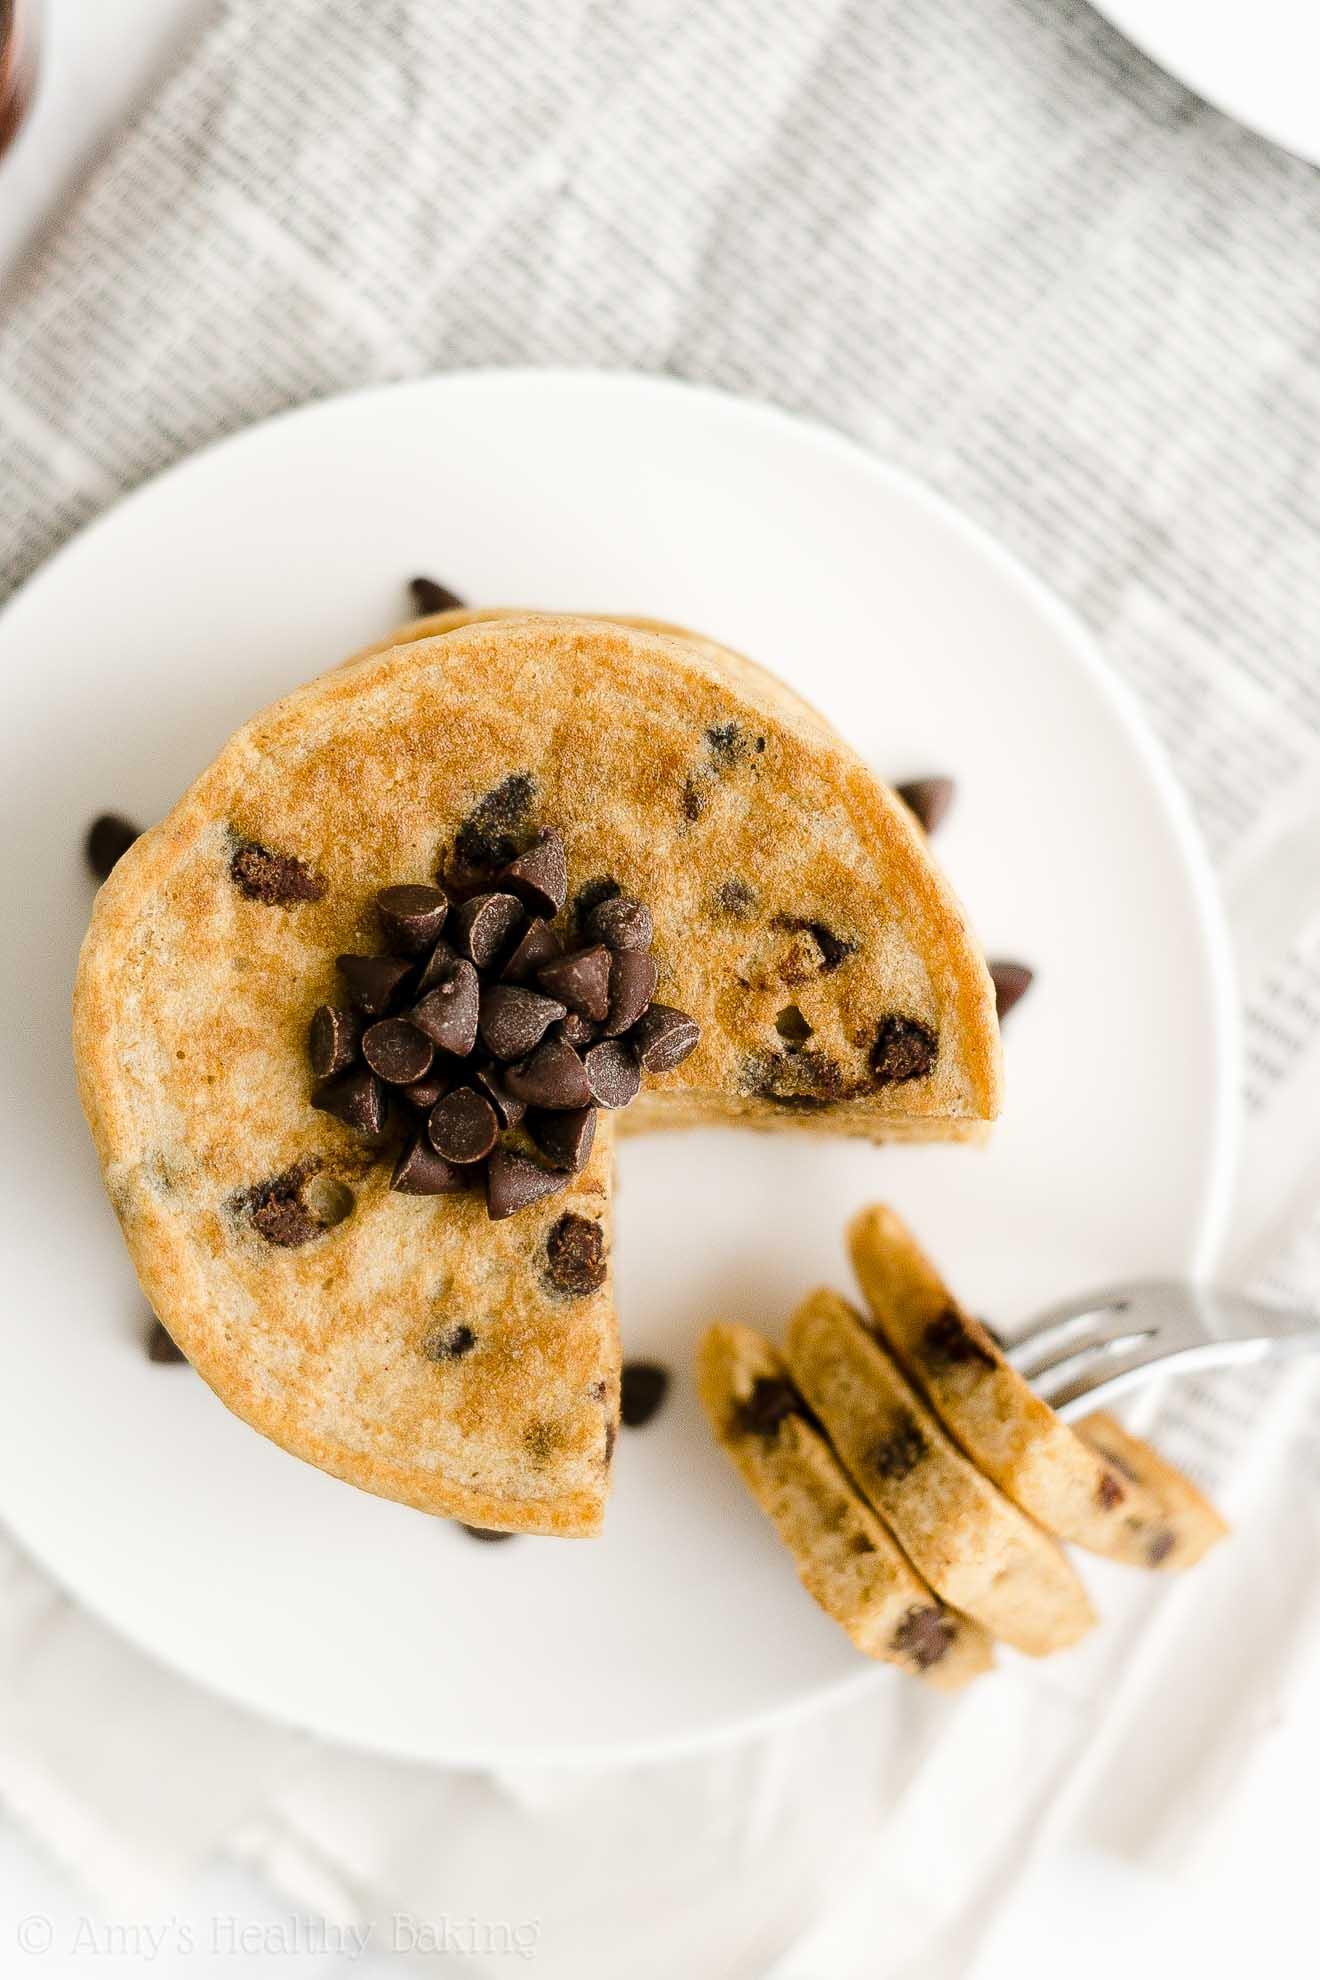 ULTIMATE Best Ever Easy Healthy Low Fat Greek Yogurt Chocolate Chip Pancakes